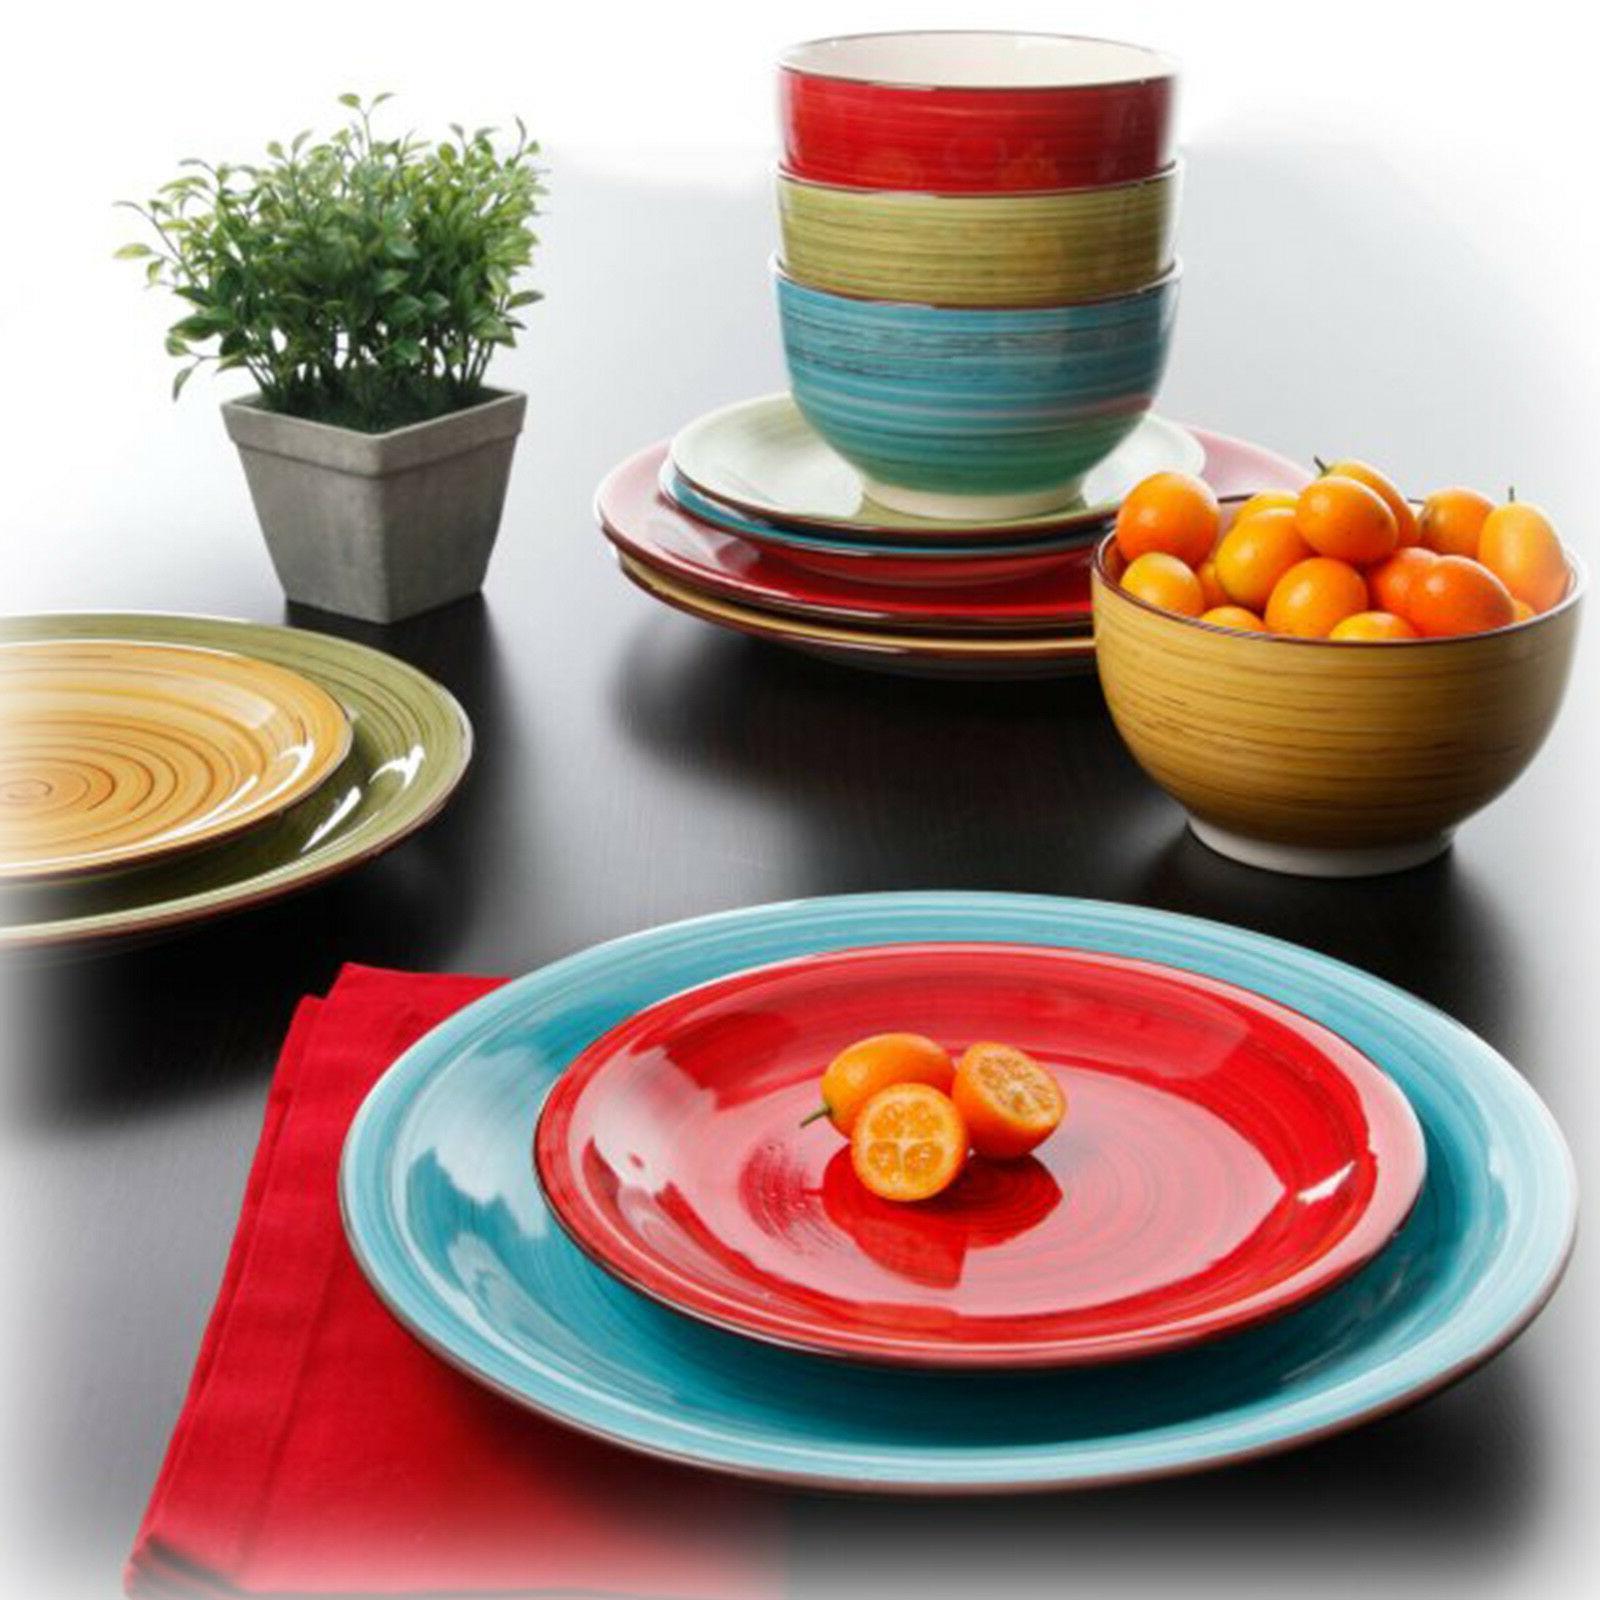 Round Dinnerware Set For 8 Durastone 24Pc Plates Bowls Dishe